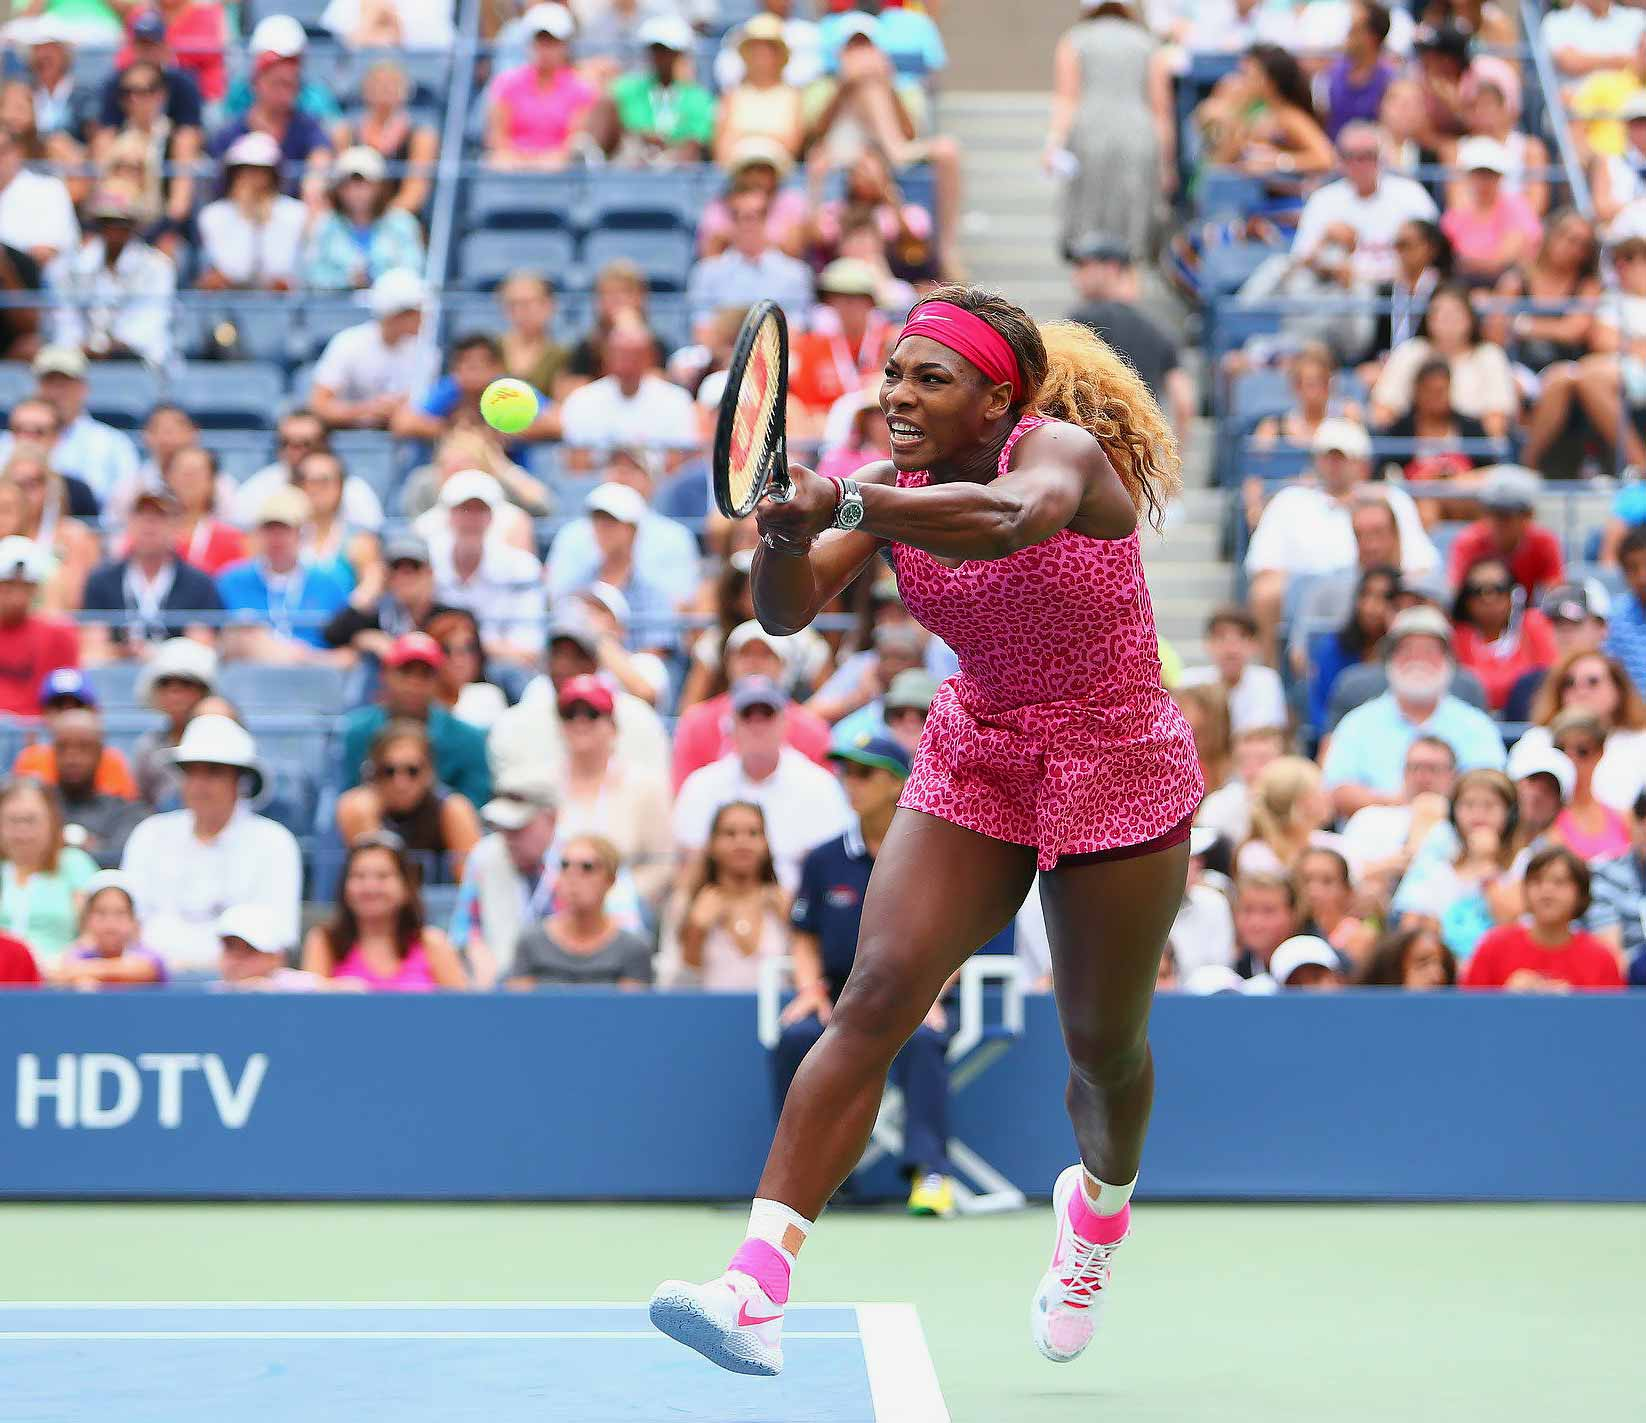 2014 US Open